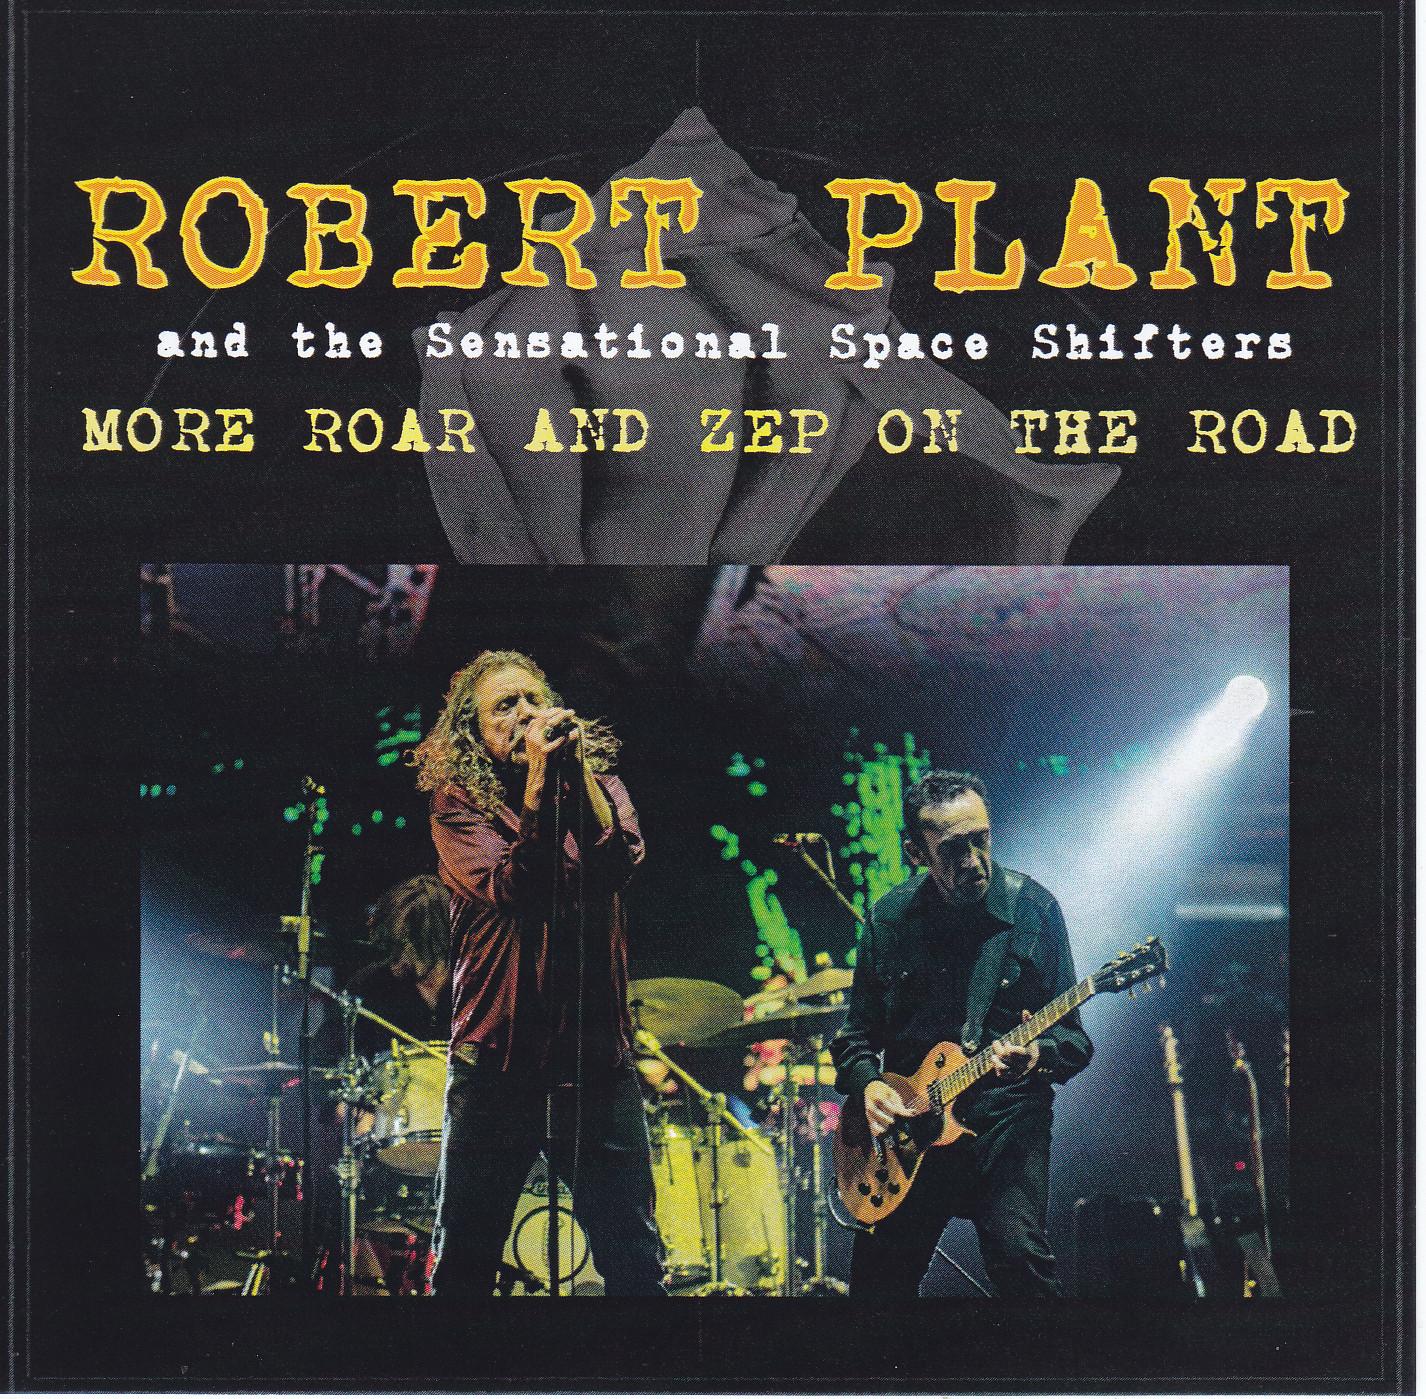 Robert plant most high